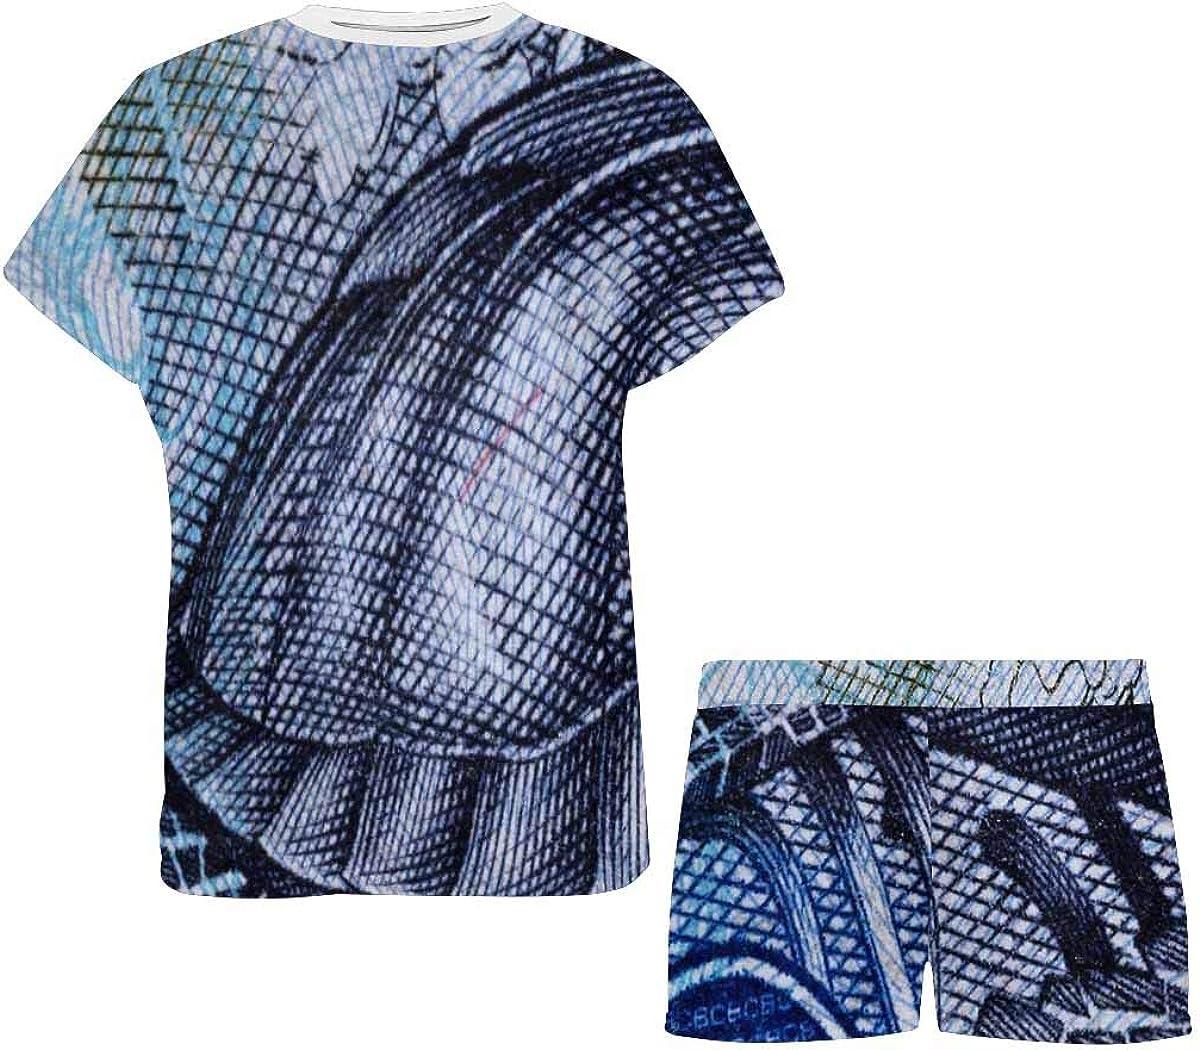 INTERESTPRINT Sea Turtle Image on Banknotes Women's Breathable 2 Piece Shorts Pajama Sleepwear Set